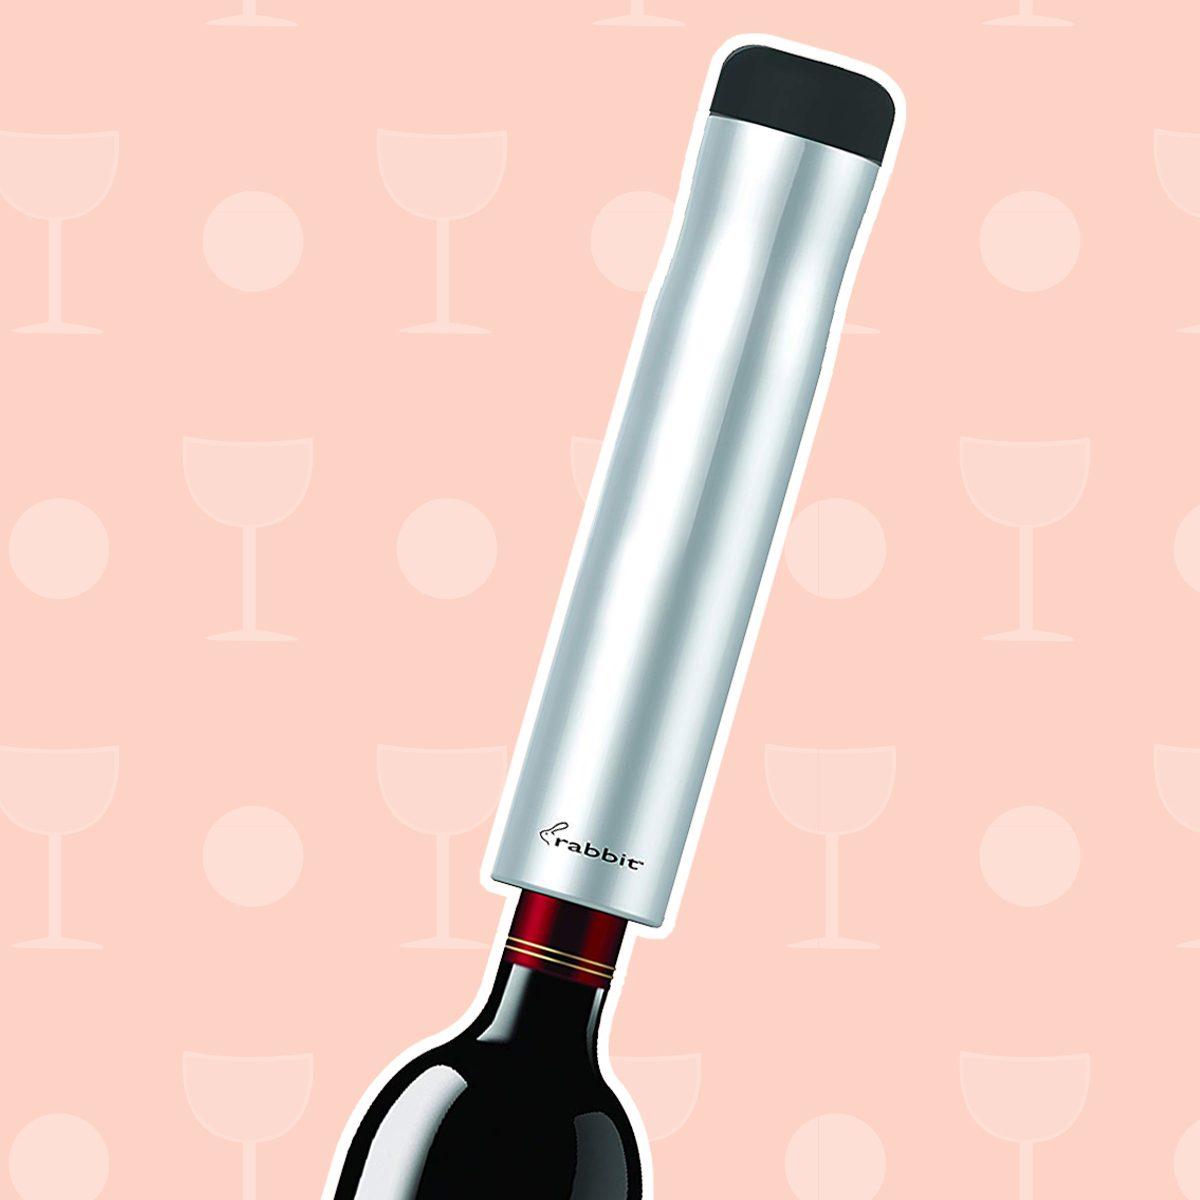 wine gifts, Electric Corkscrew Wine Bottle Opener